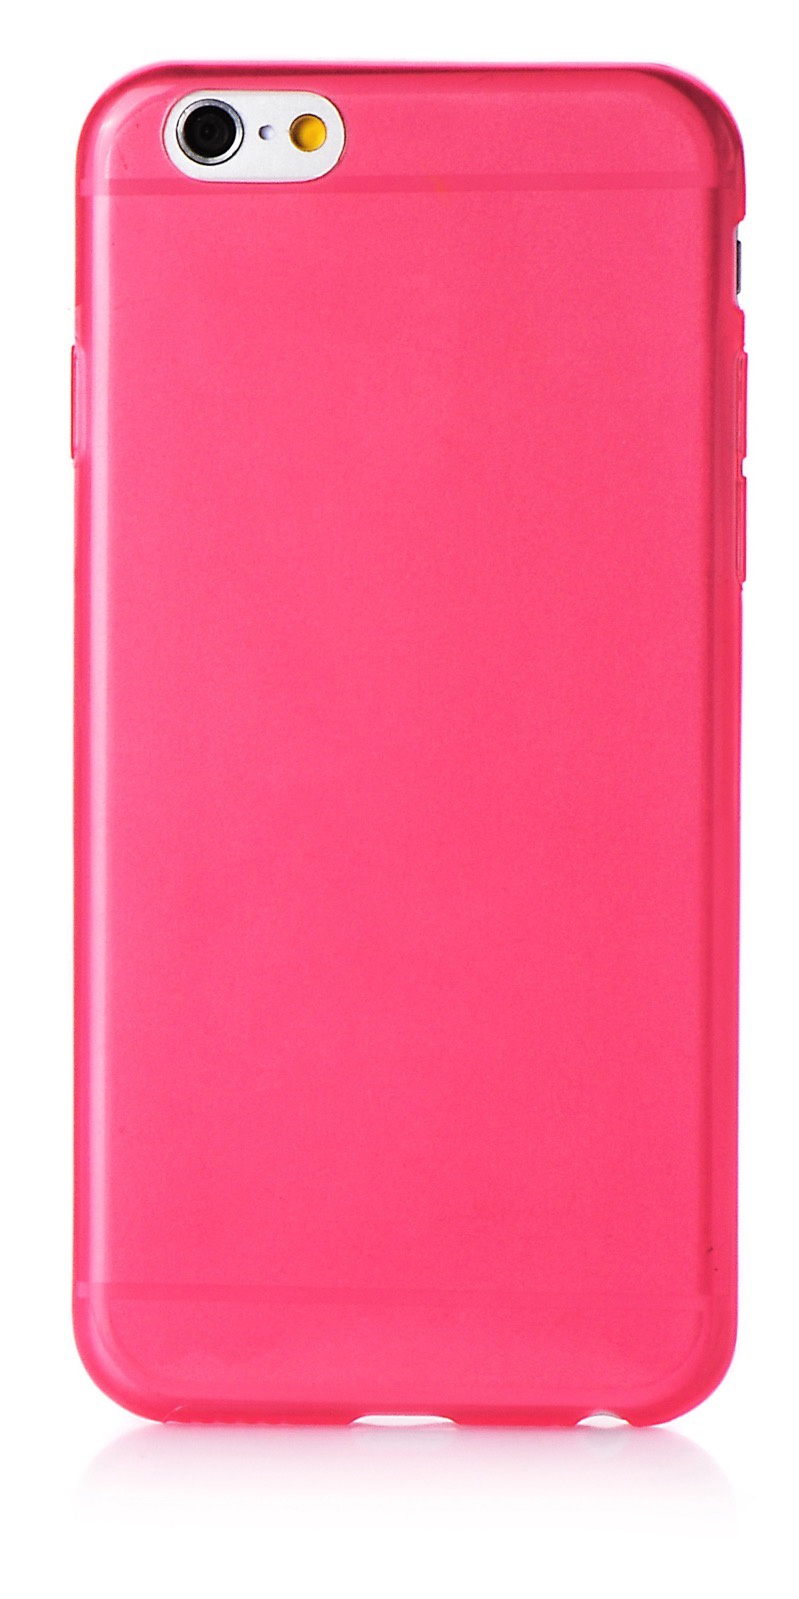 "Чехол для сотового телефона iNeez накладка силикон 0.3 mm глянцевый 620070 для Apple iPhone 6 Plus/6S Plus 5.5"", розовый"